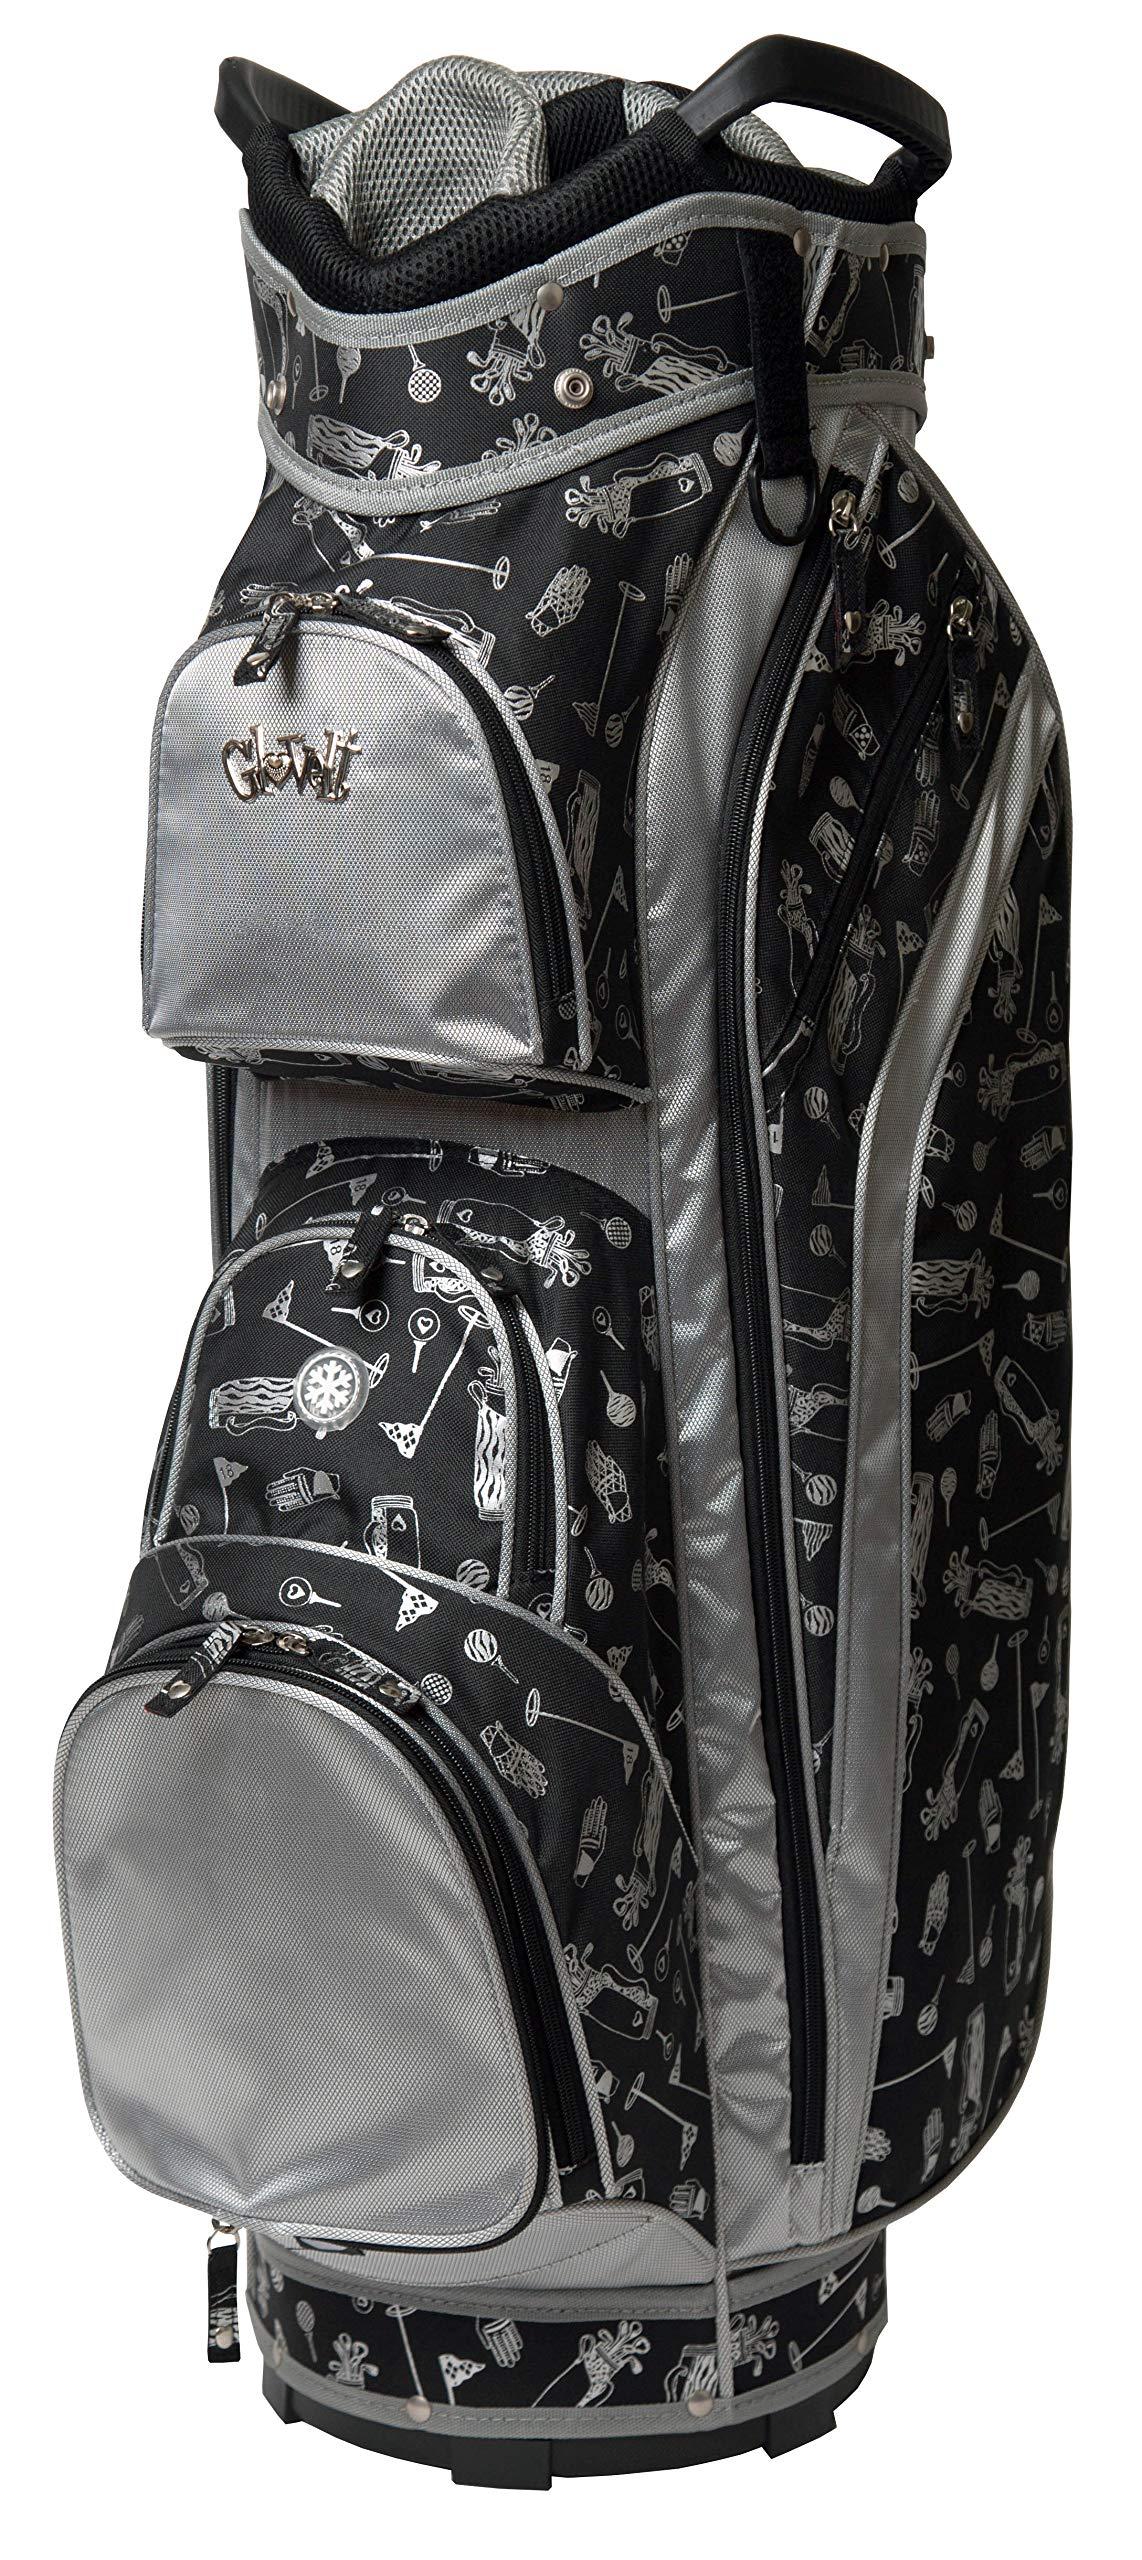 Women's Golf Bag - Glove It - Ladies 14 Way Golf Carry Bag - Golf Cart Bags for Women - Womens Lightweight Golf Travel Case - Easy Lift Handle - 2018 Gotta Glove It by Glove It